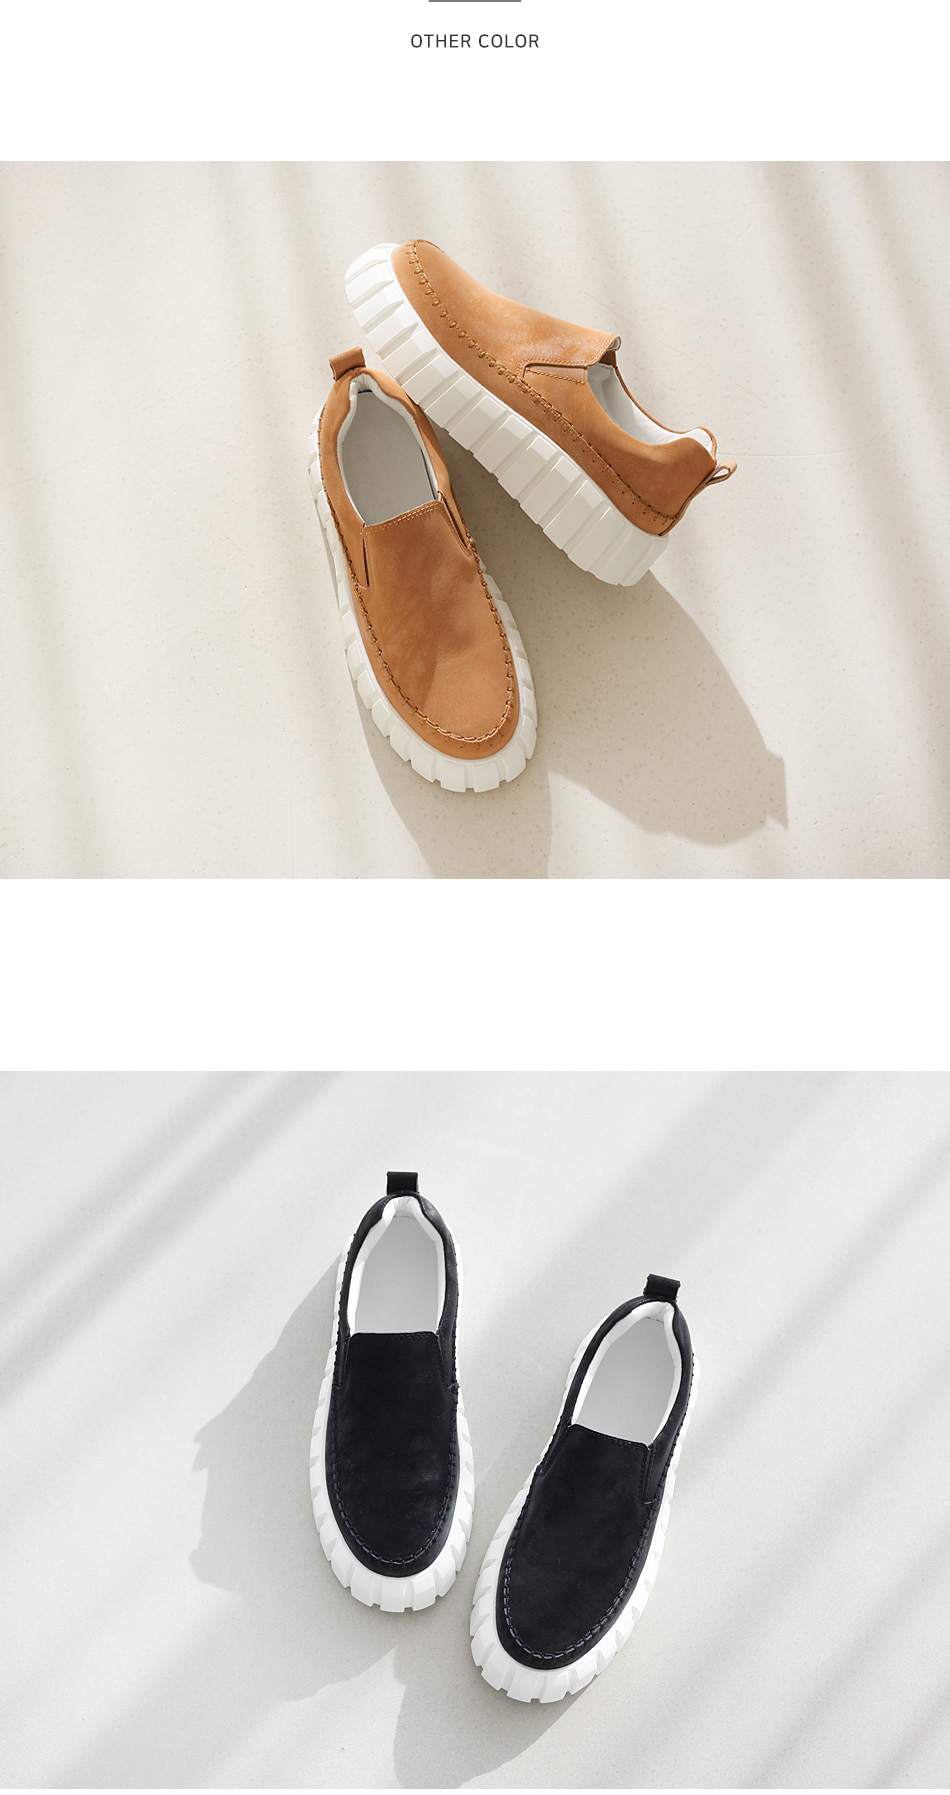 Shravel leather heel slip-on 4cm